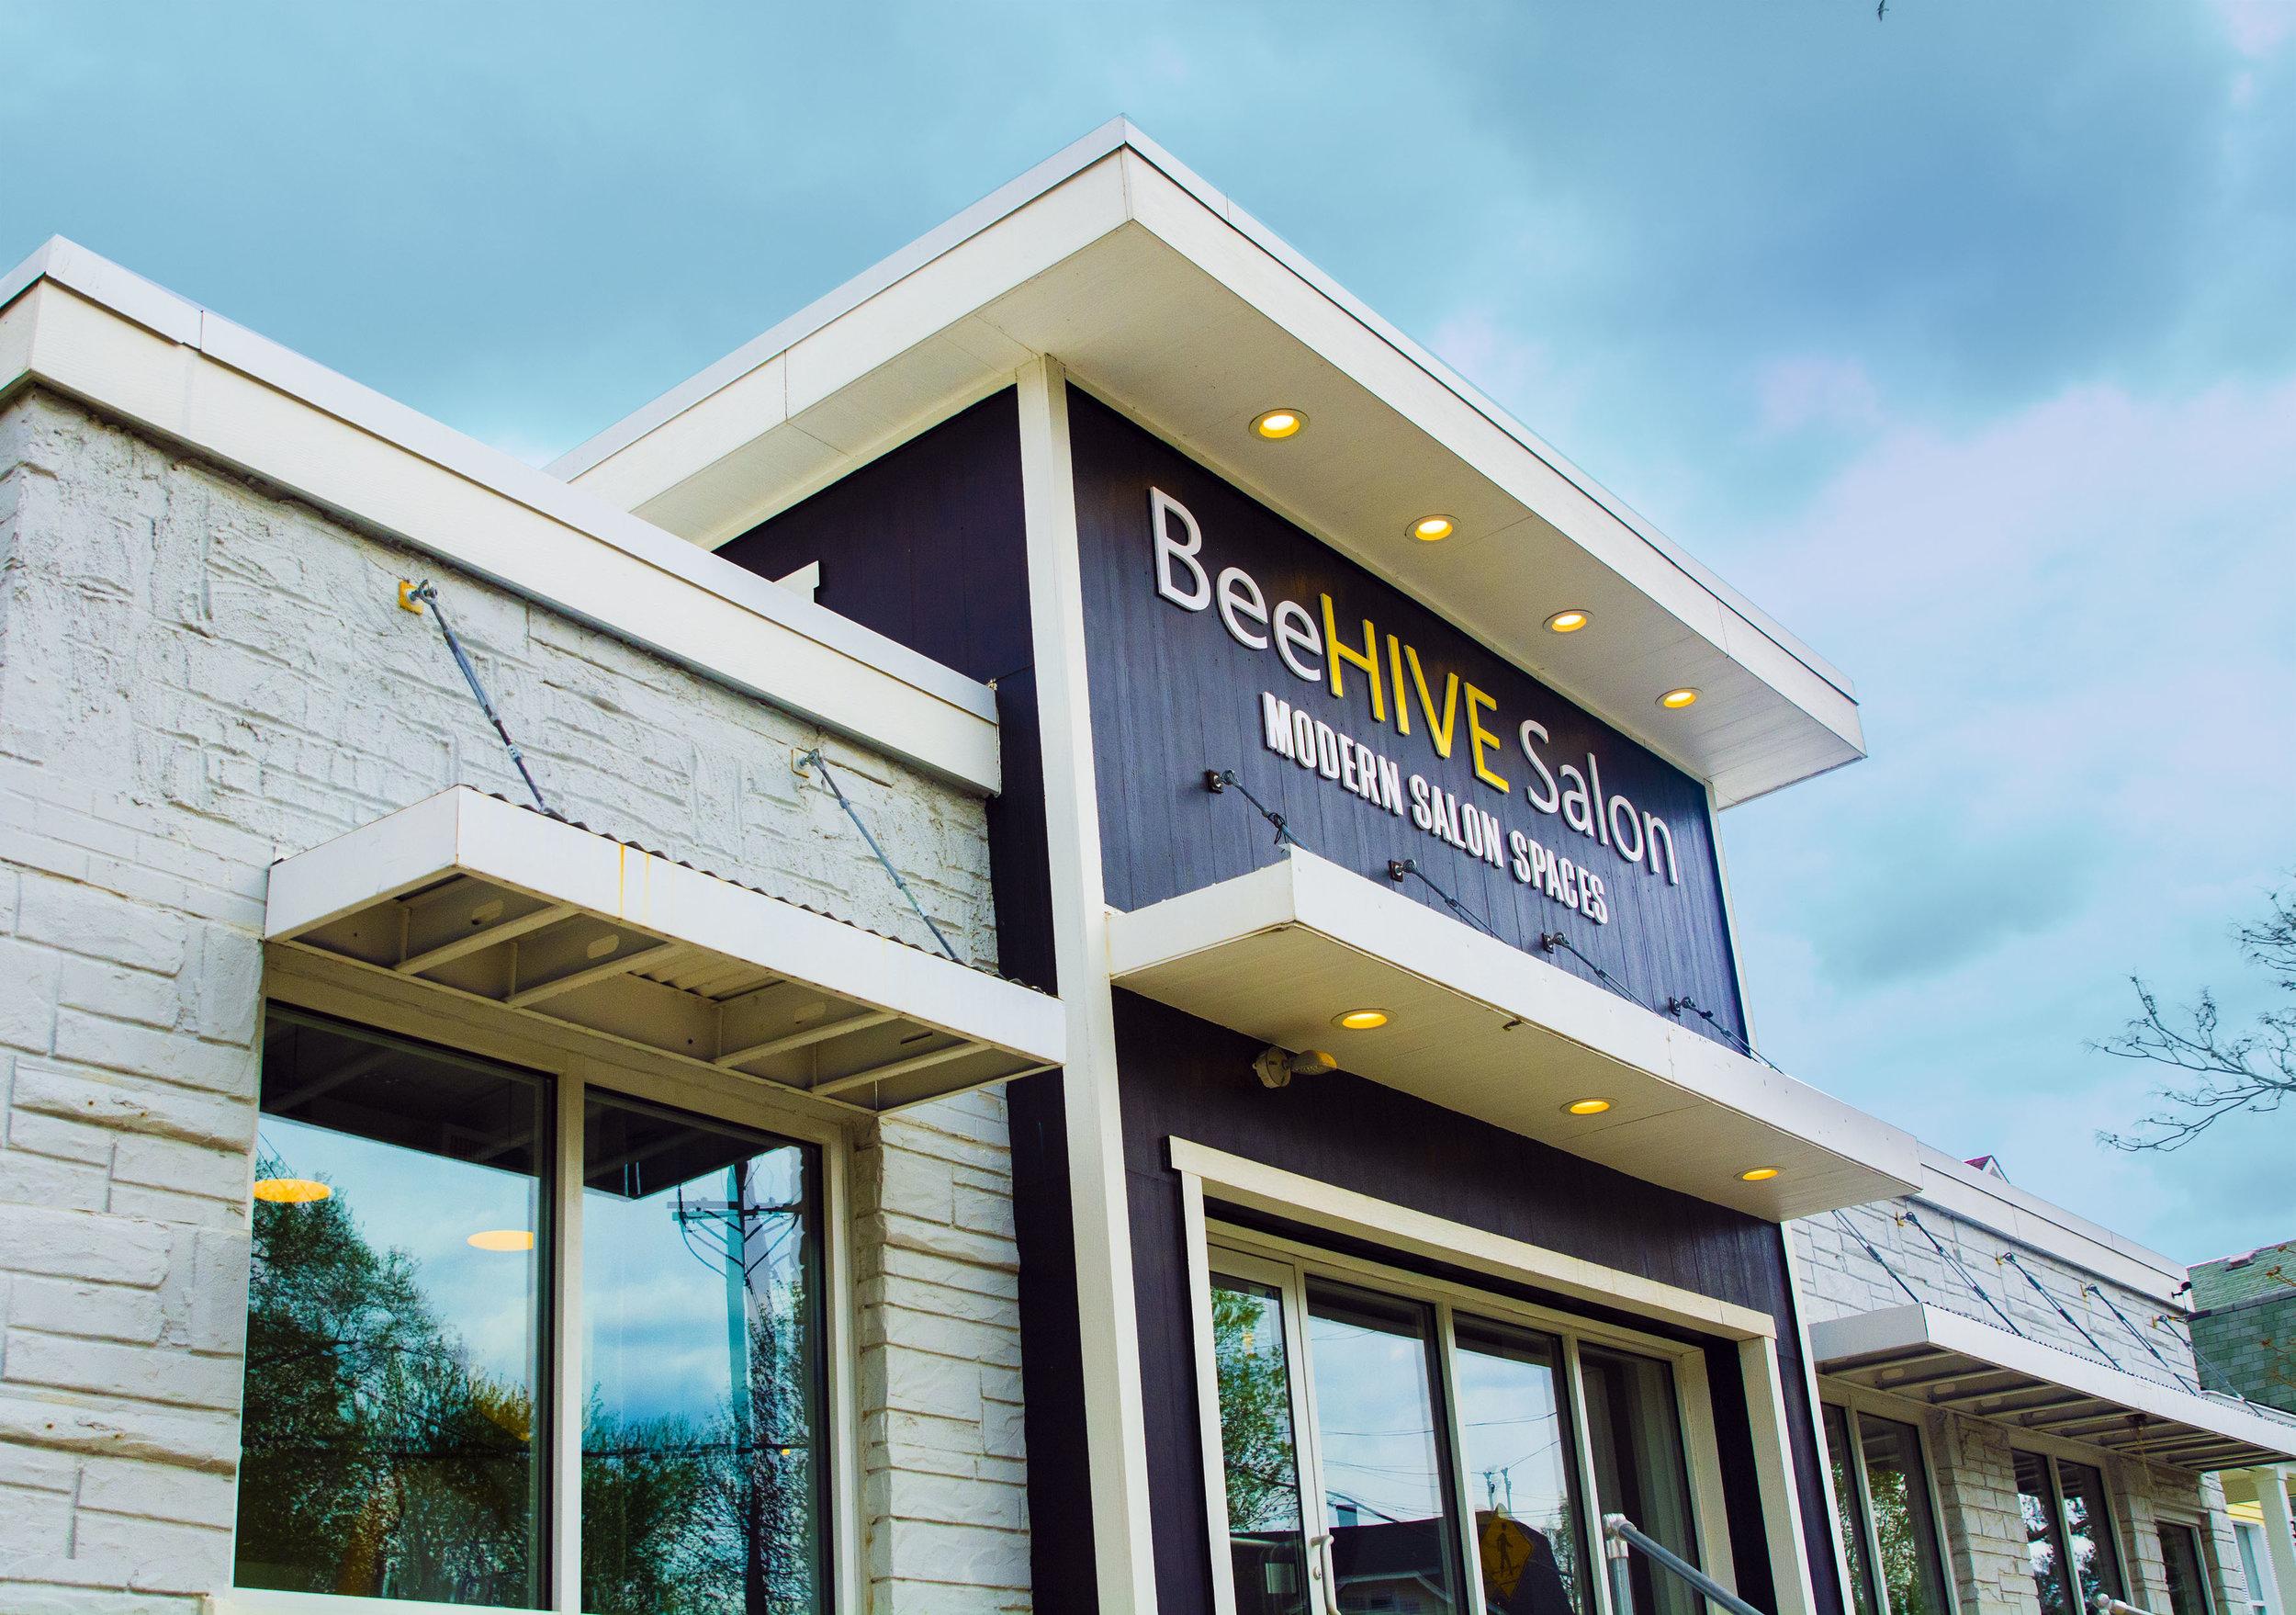 BeeHive_OakleySpace_Storefront.jpg